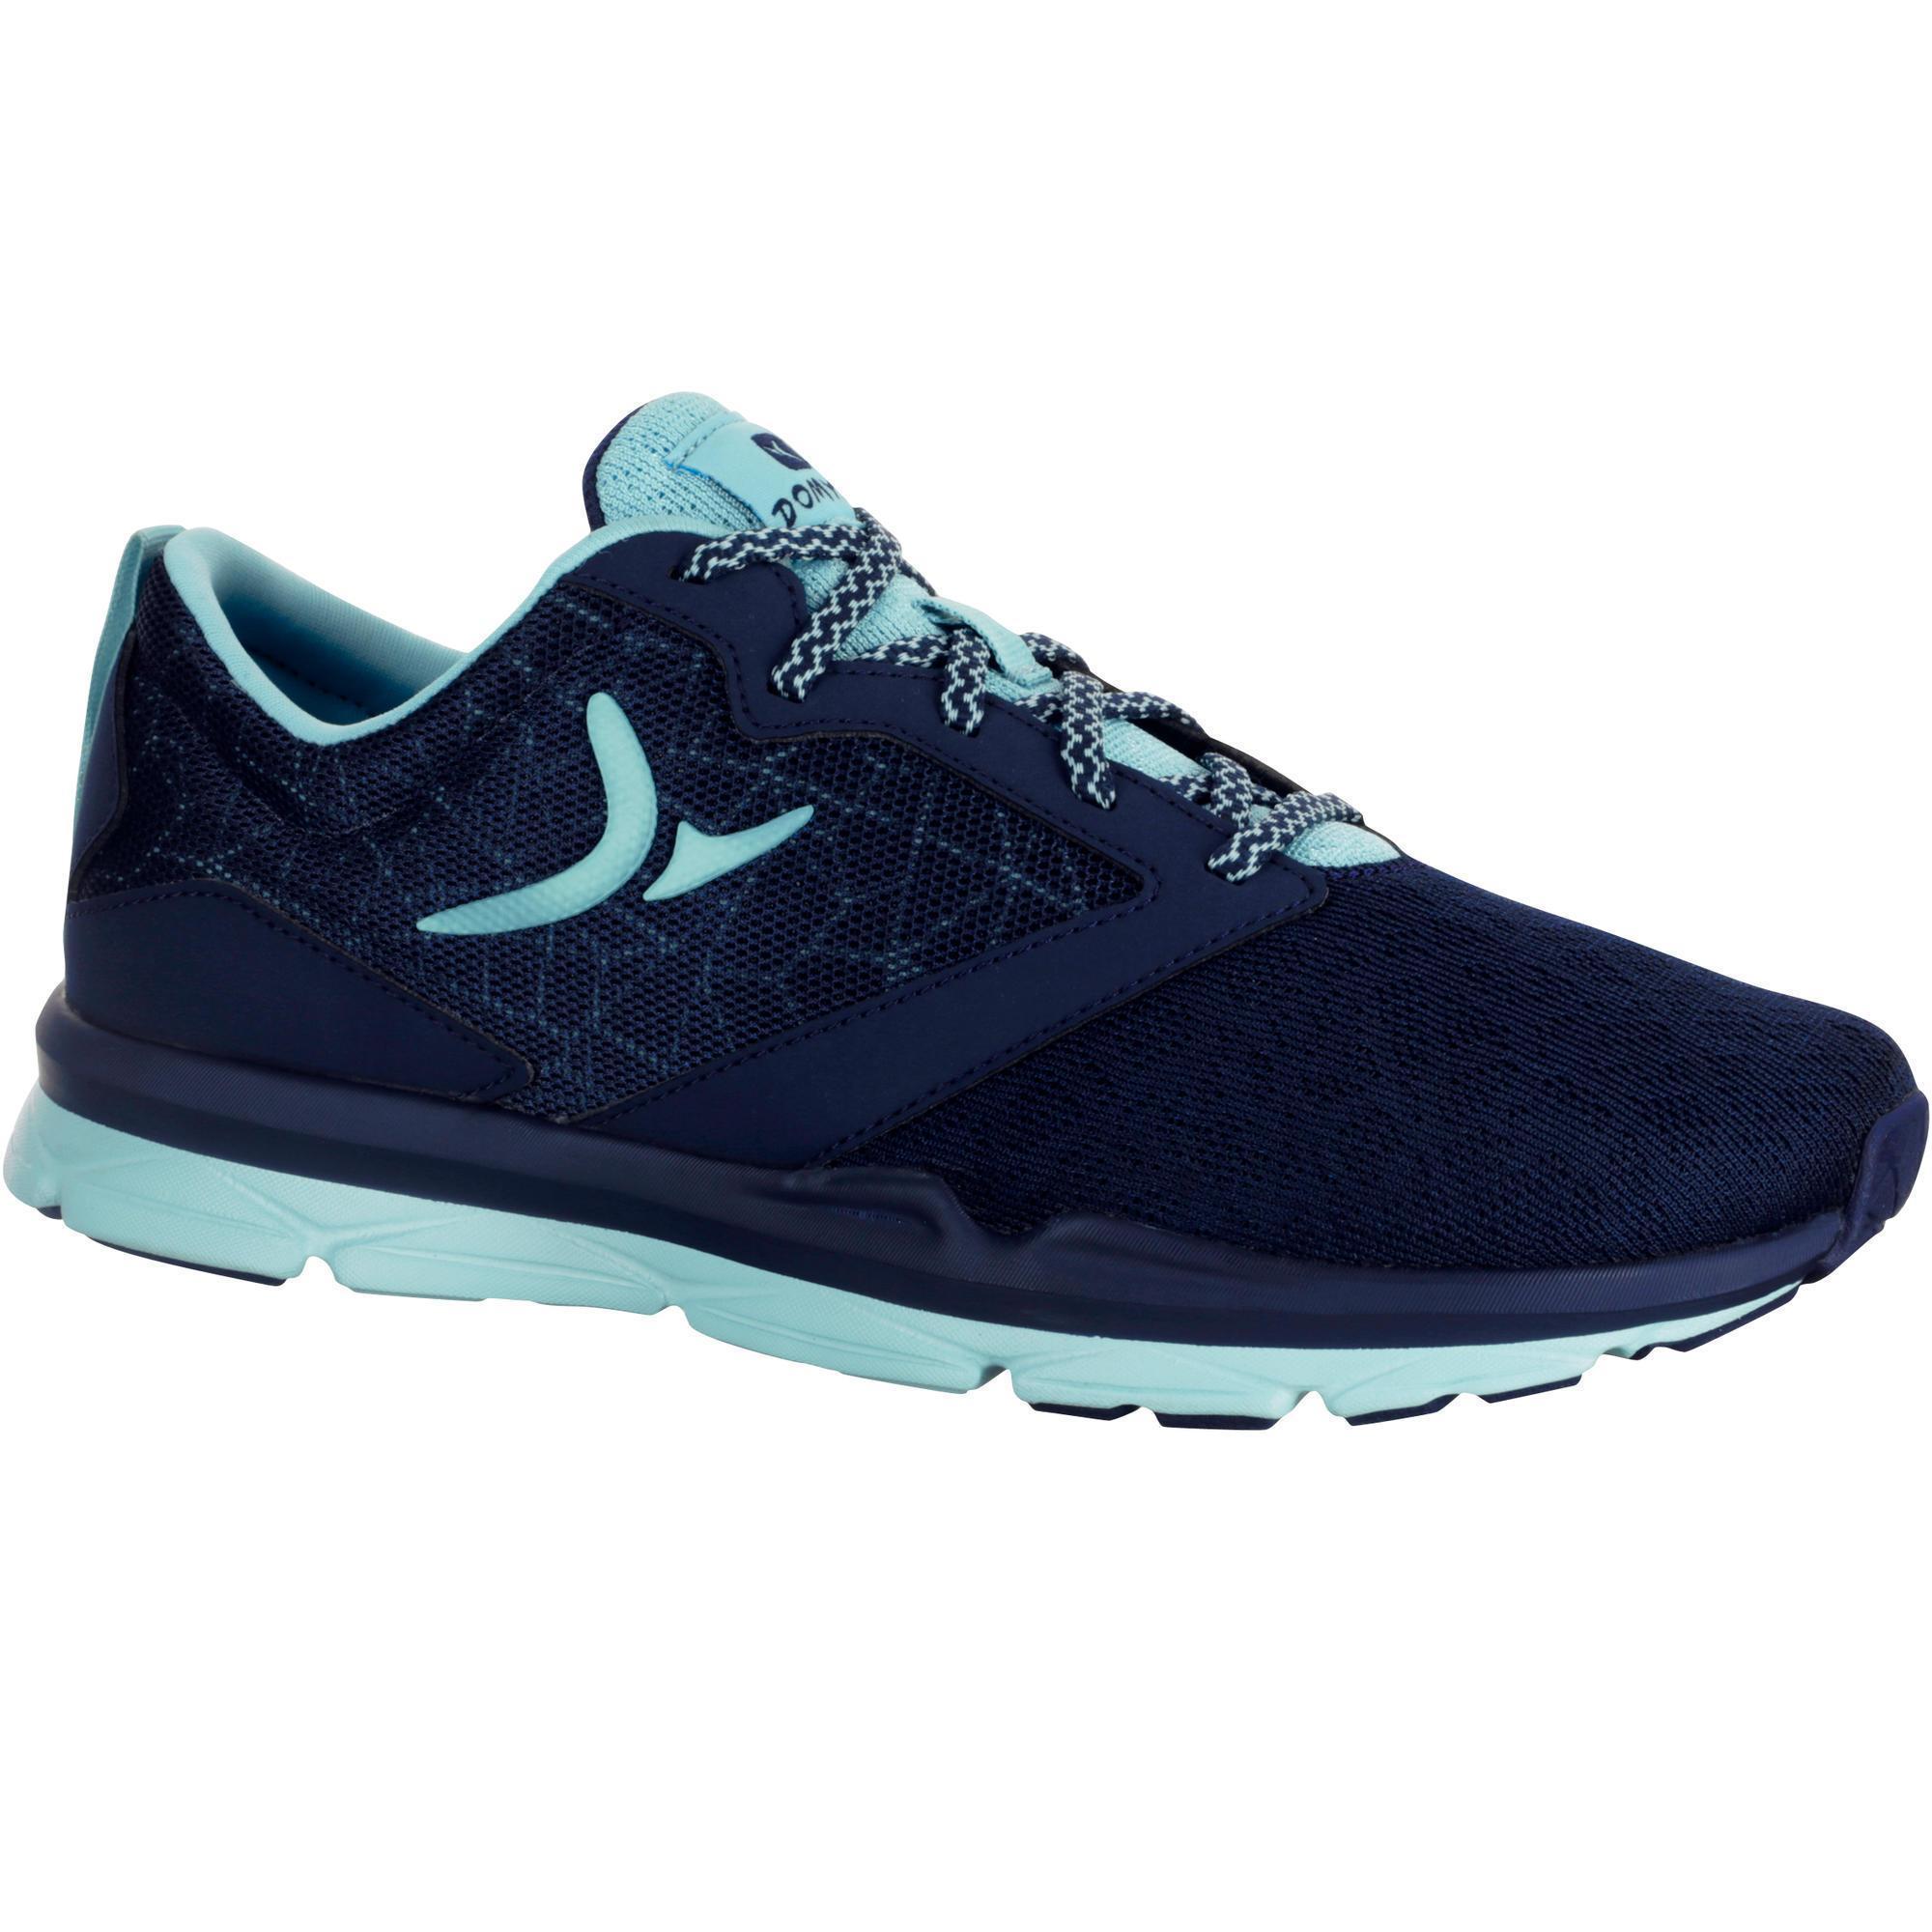 Tonic E Bleu Dc Shoes